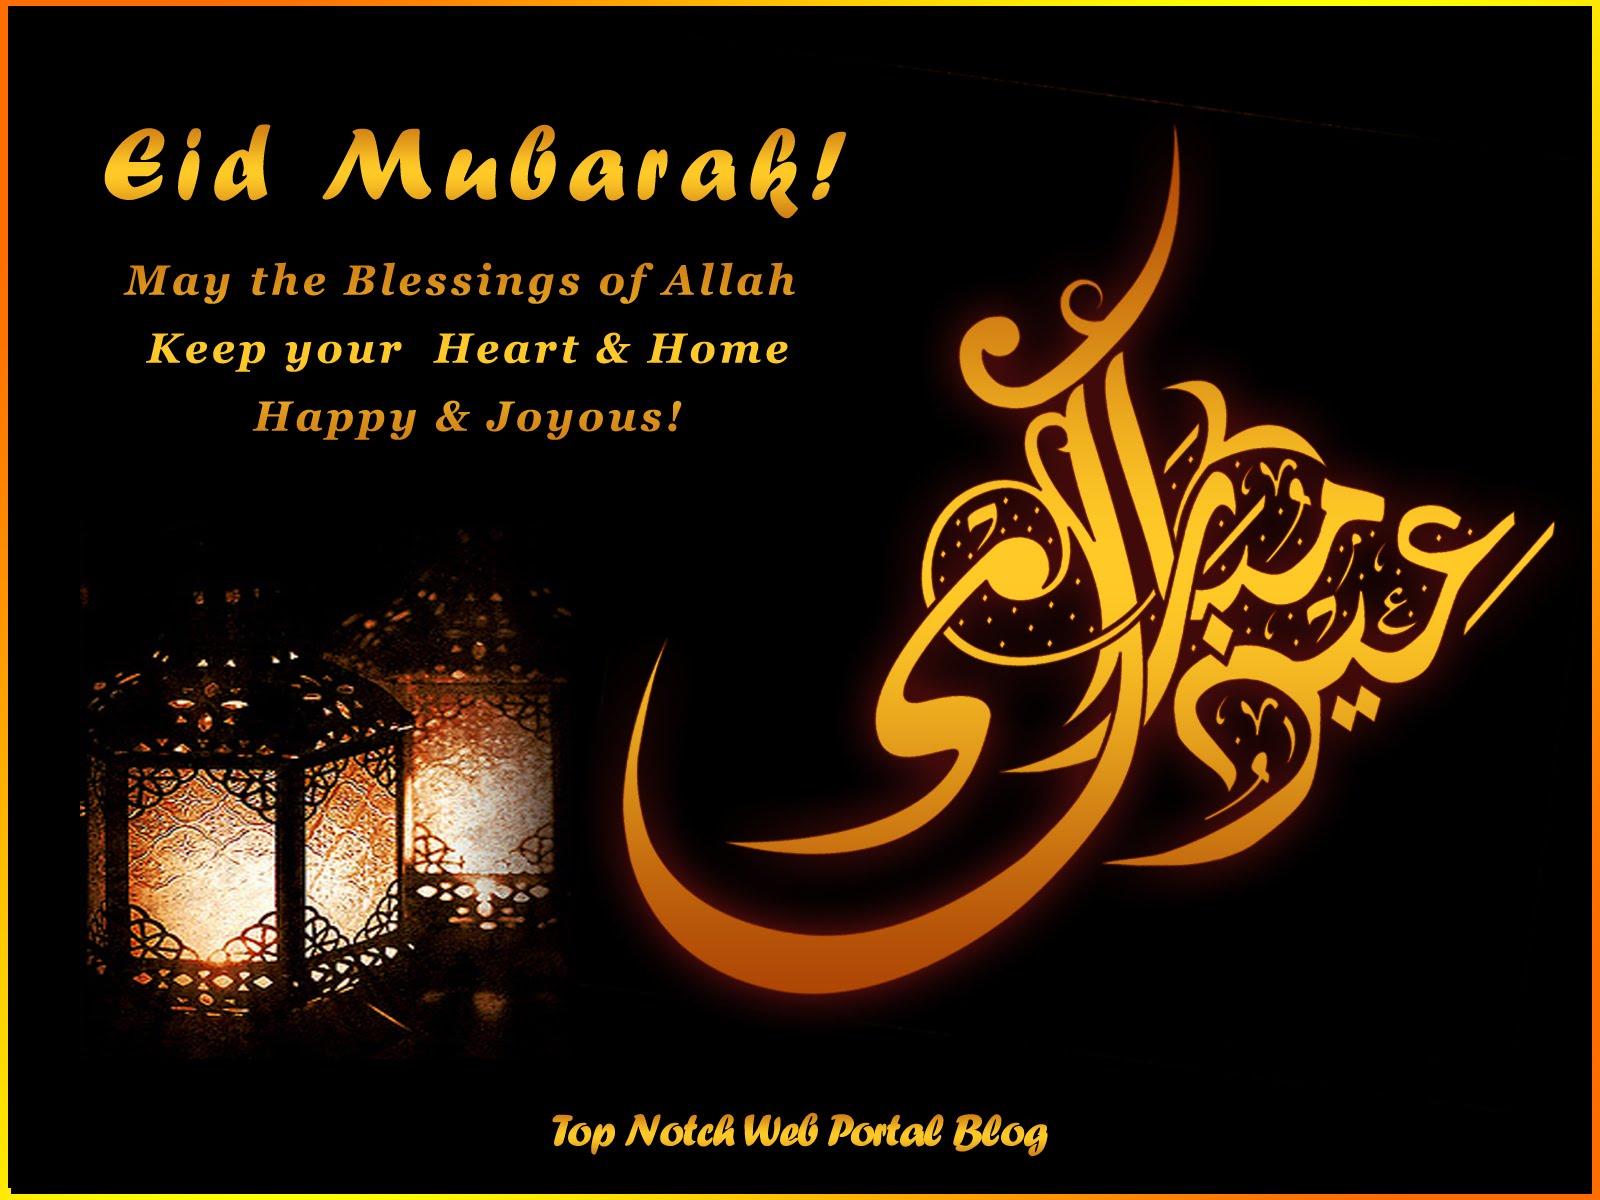 Eid ul adha bakra eid mubarak pictures greetings images in eid ul adha bakra eid mubarak pictures greetings images in malayalam 2018 m4hsunfo